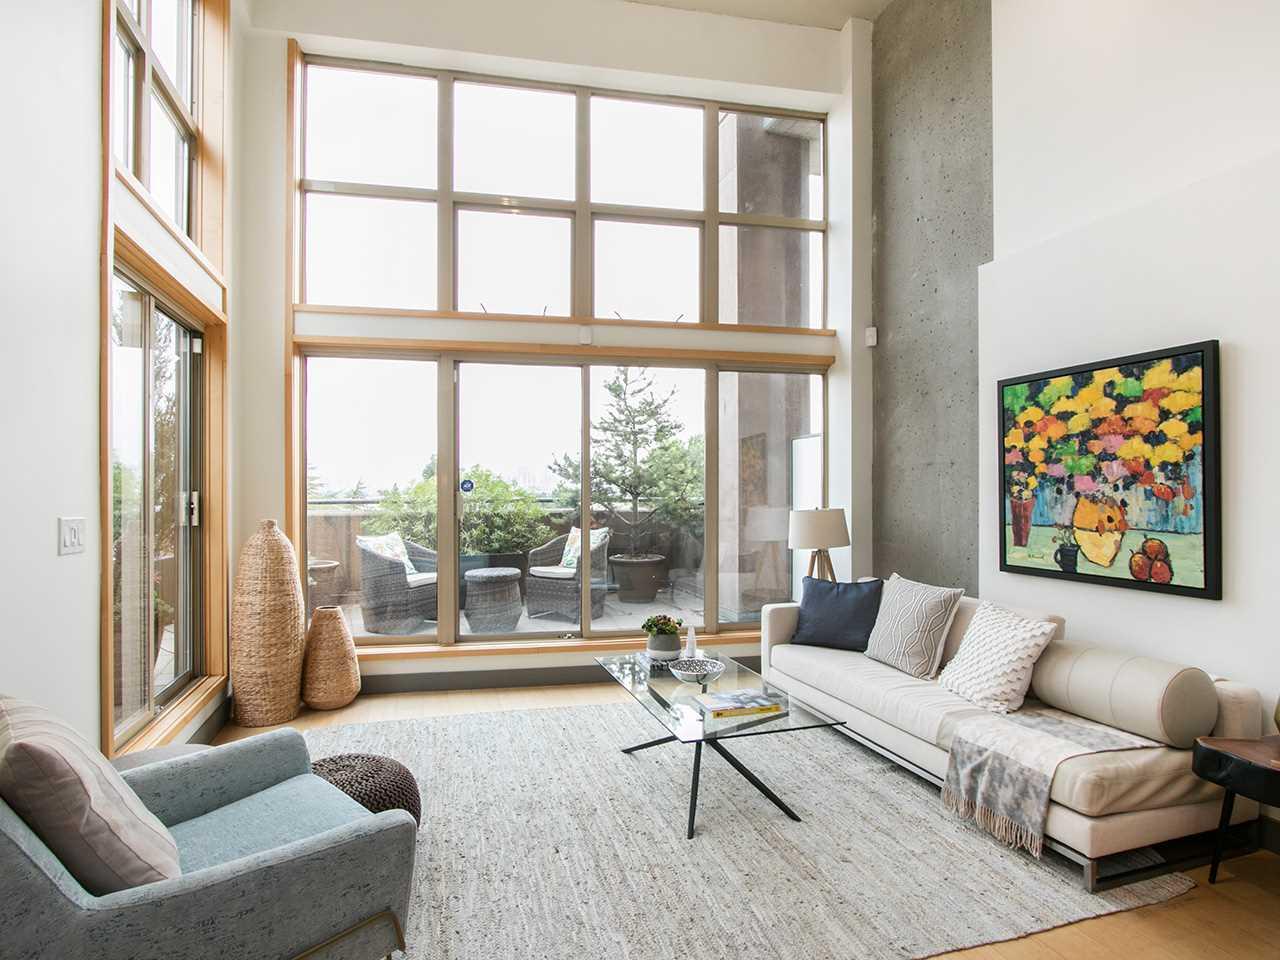 Condo Apartment at 403 1529 W 6TH AVENUE, Unit 403, Vancouver West, British Columbia. Image 2